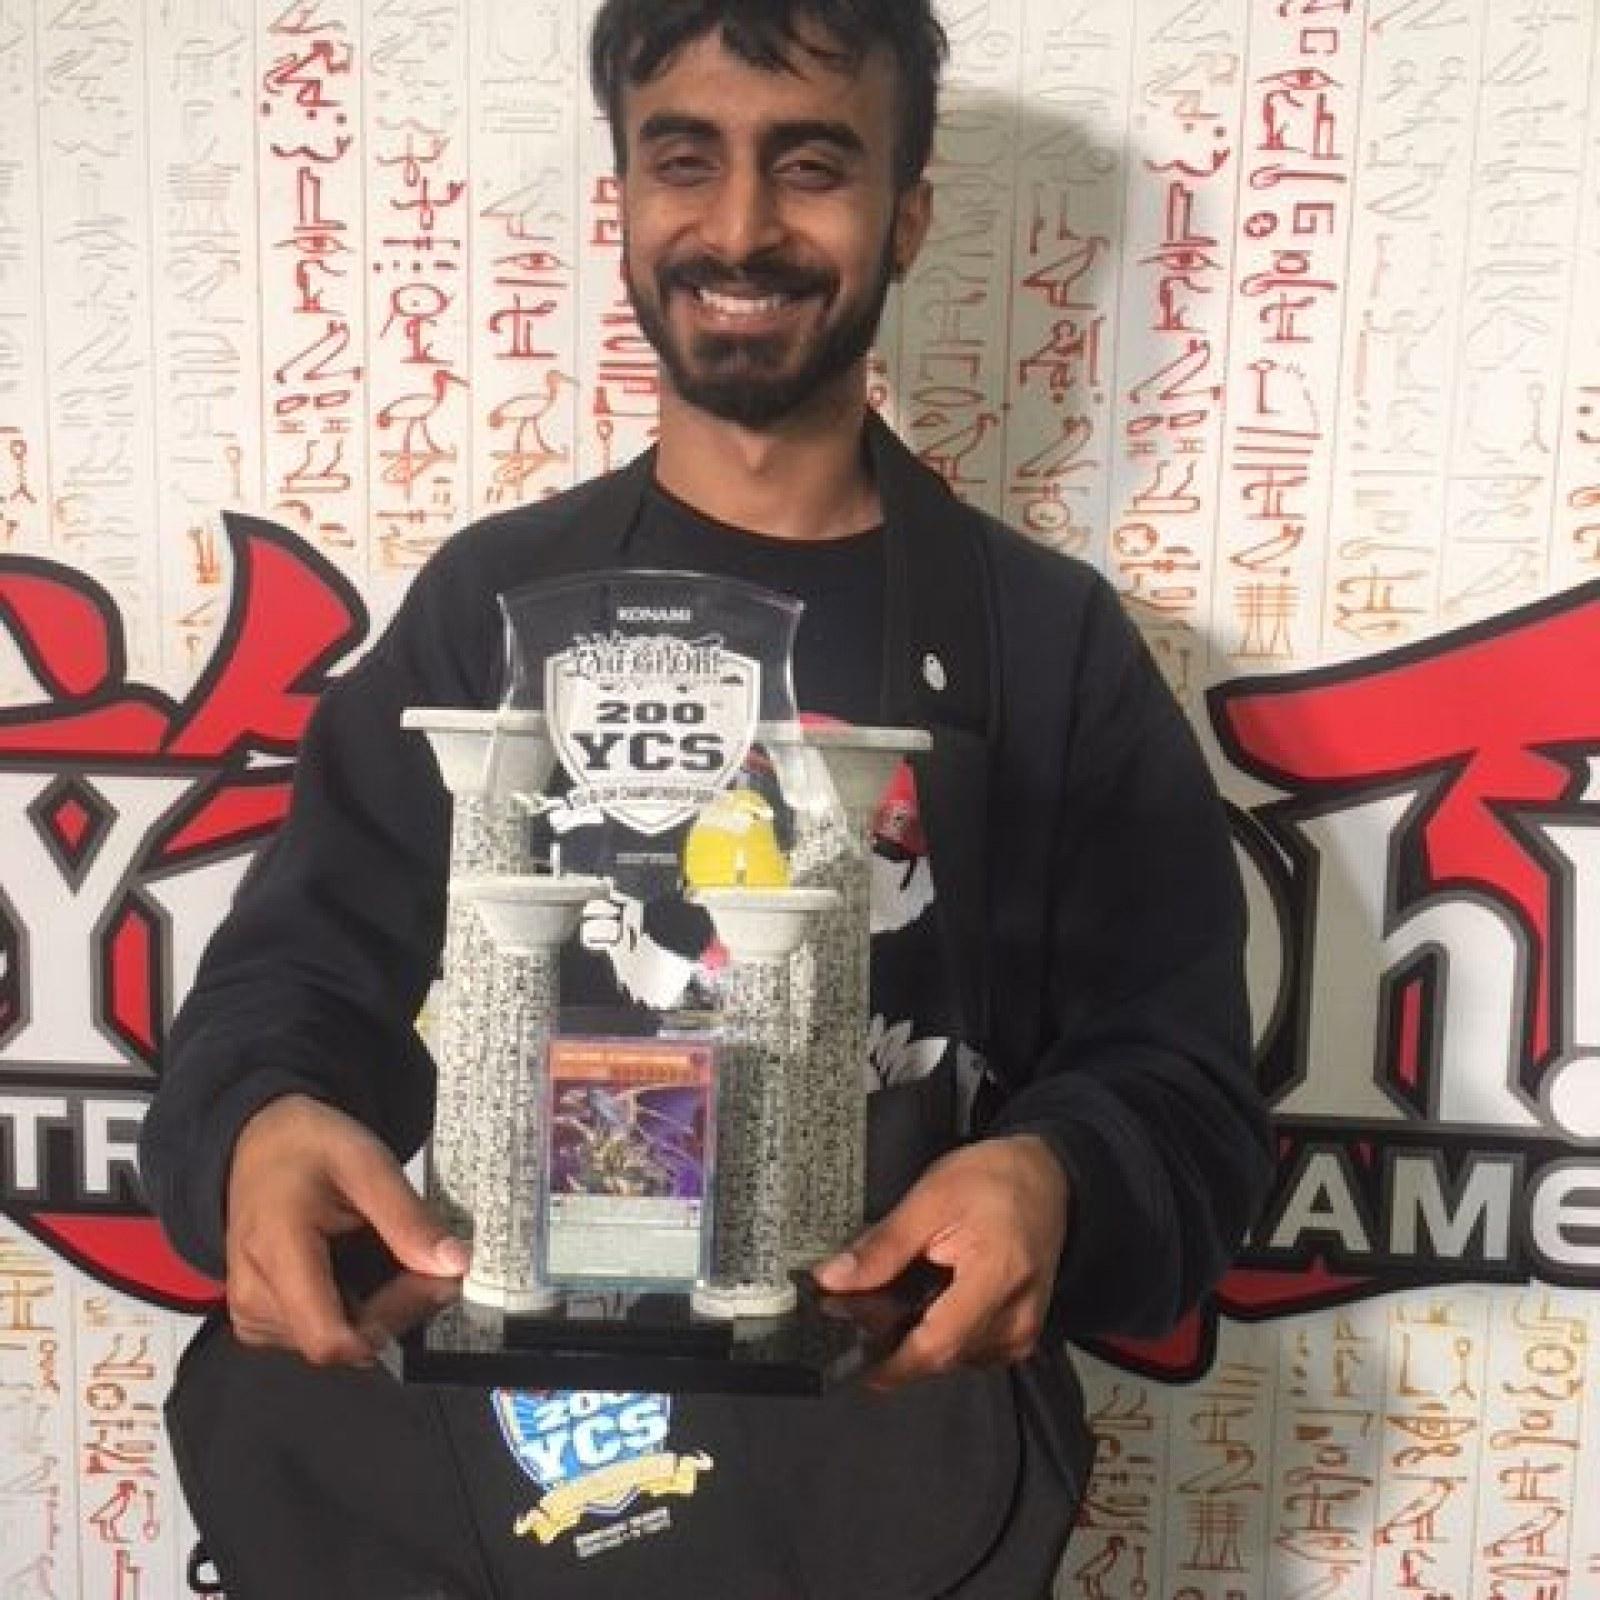 Yu-Gi-Oh! YCS 200 Champion, Manav Dawar Talks Sky Striker